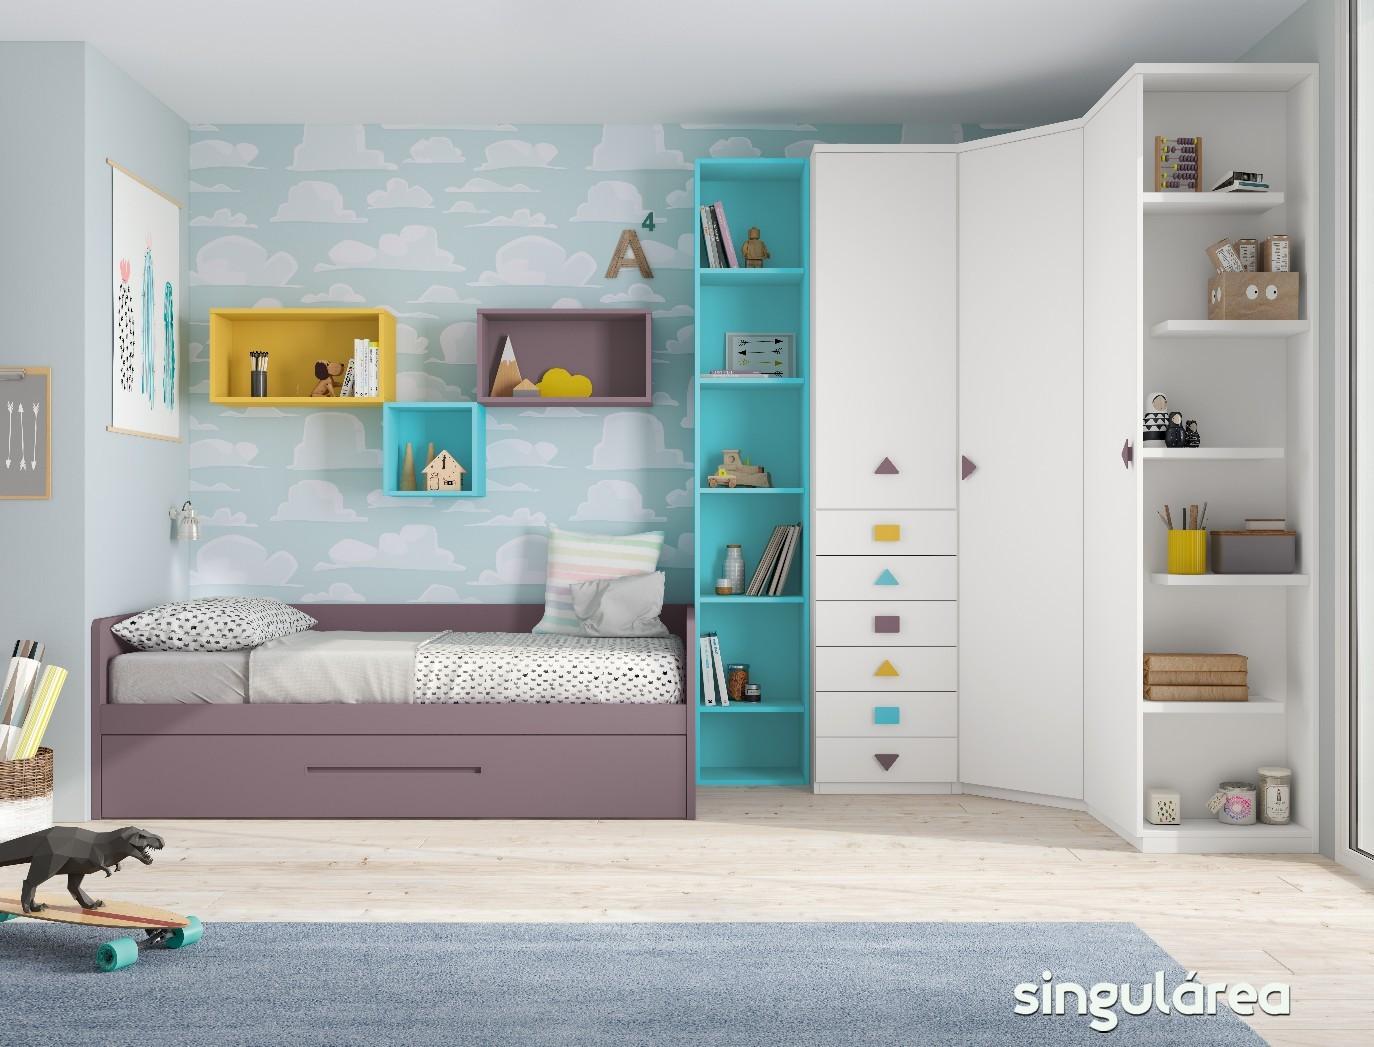 blog dormitorios juveniles com novedades camas nido para On dormitorios infantiles